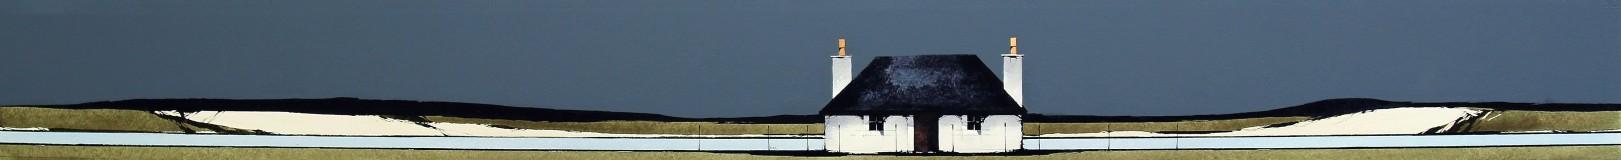 Ron Lawson_Island Cottage II_EAS606_Watercolour & Gouache_3.75x38.5